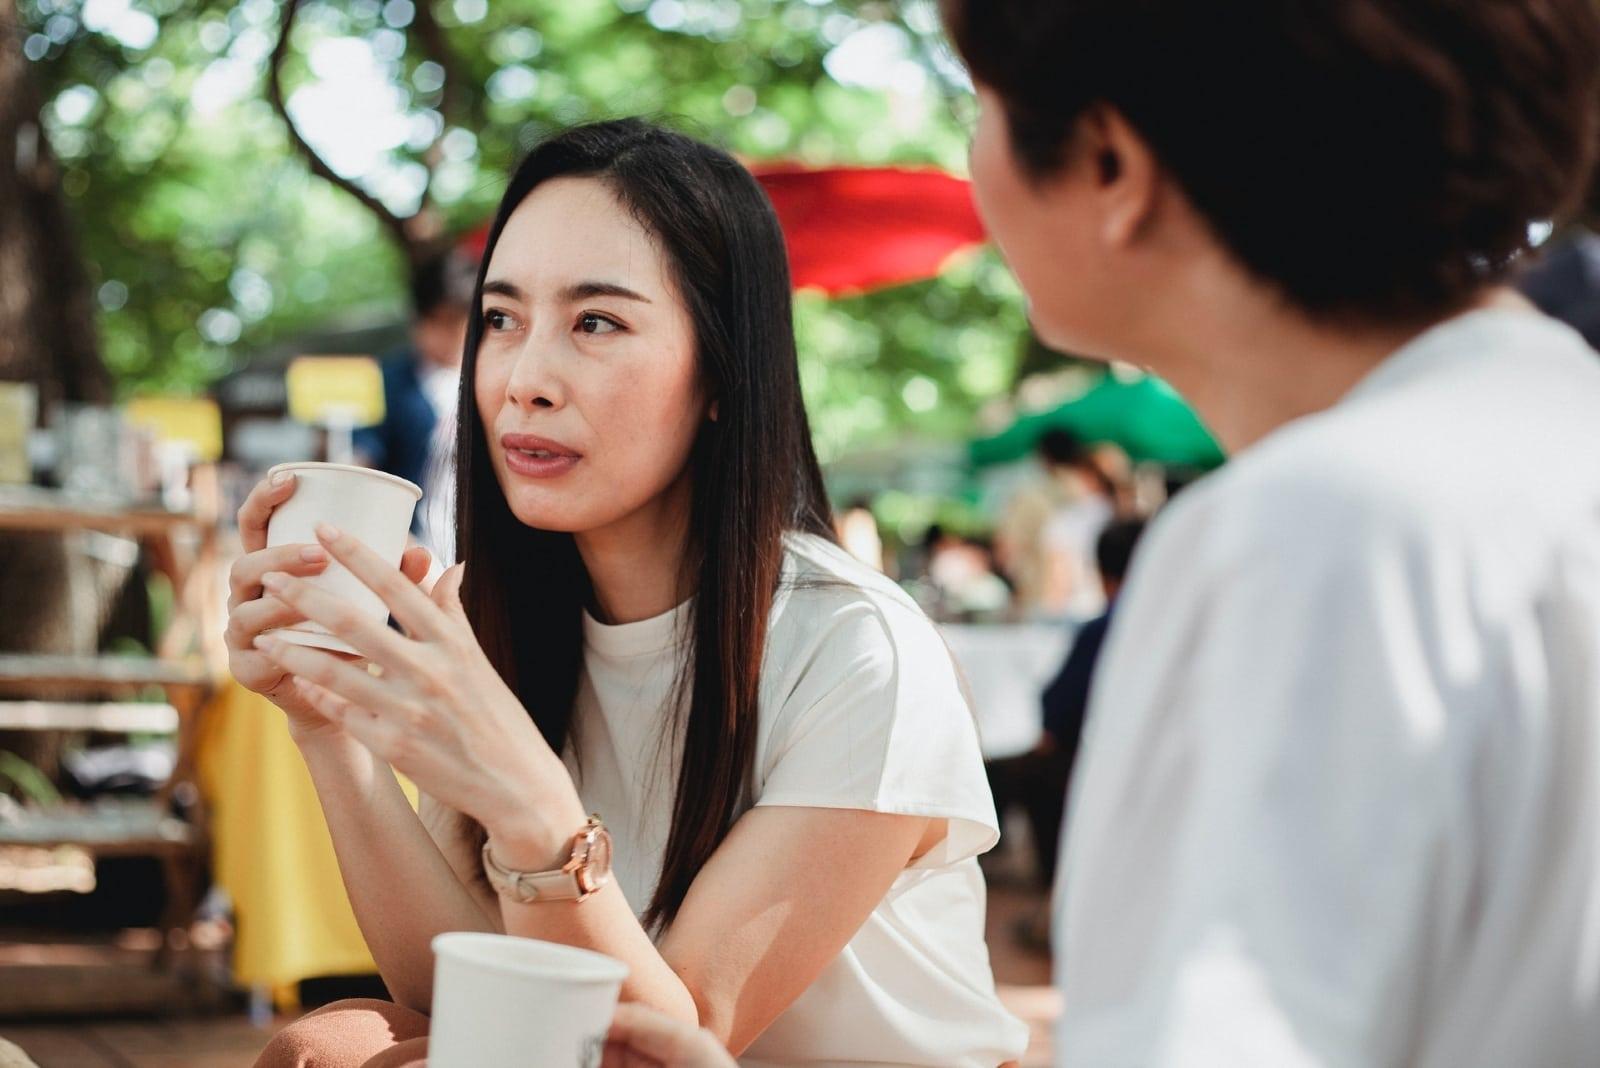 two women talking while having coffee